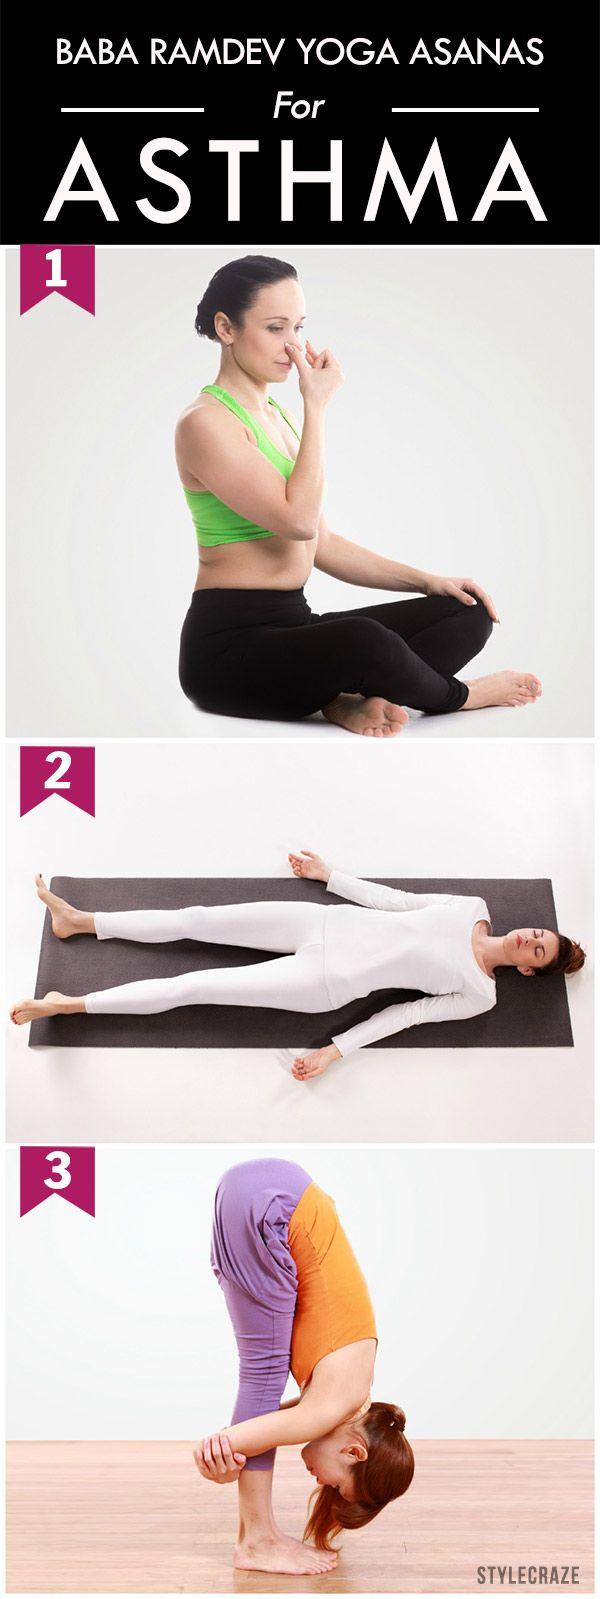 Yoga Poses & Workout : 3 Baba Ramdev Yoga Asanas To Treat Asthma